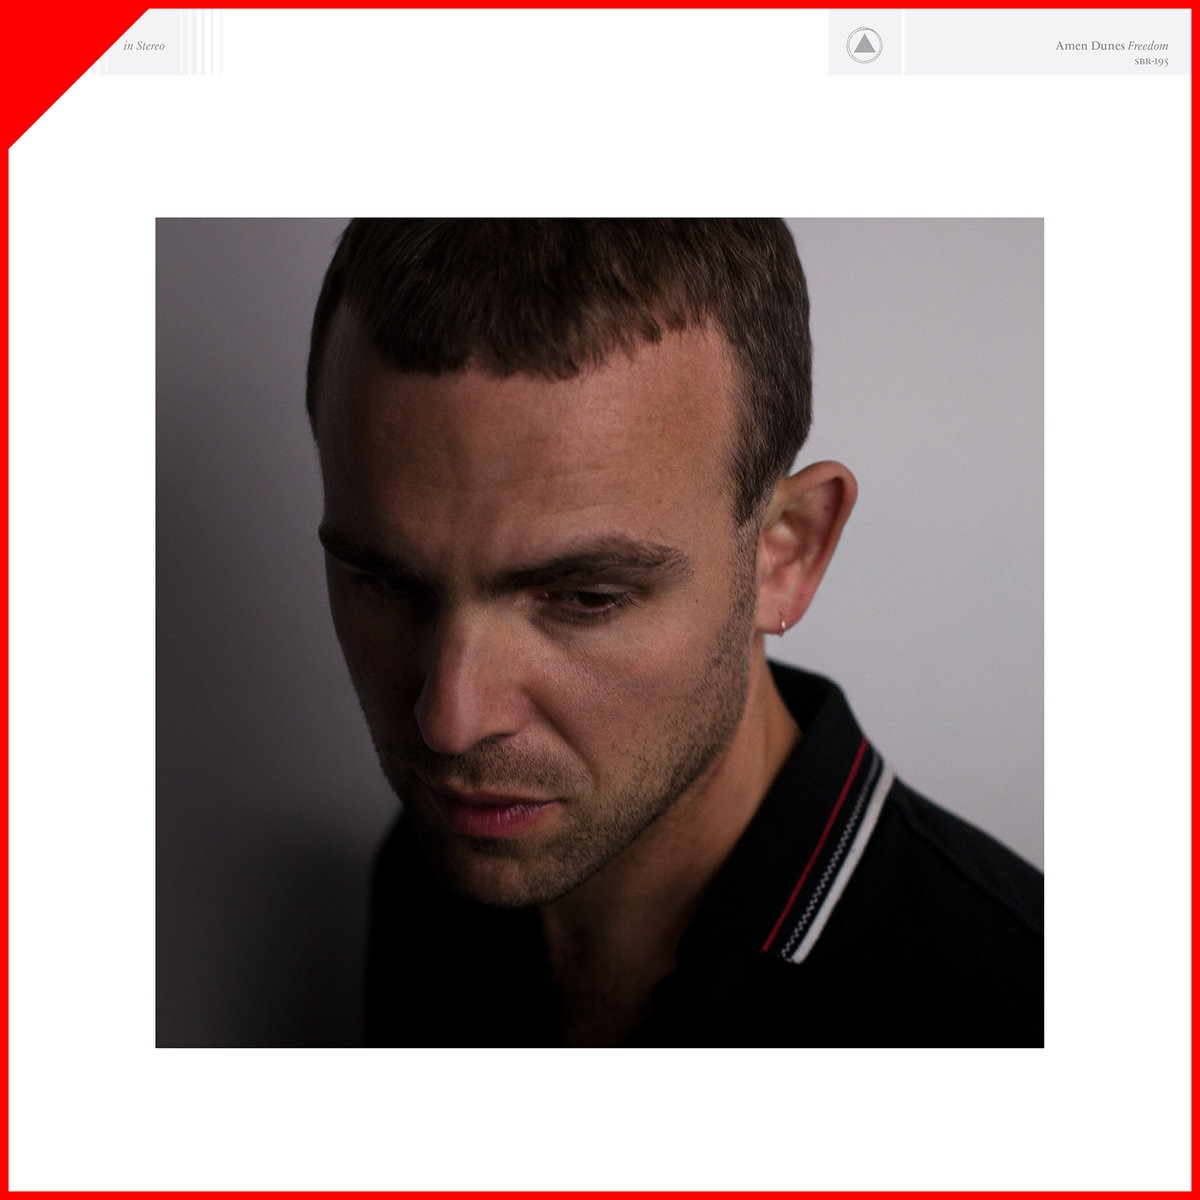 Freedom - Amen DunesSacred Bones RecordsMarço/2018Indie rock, rock alternativoO que achamos: Muito BomTimbre Recomenda